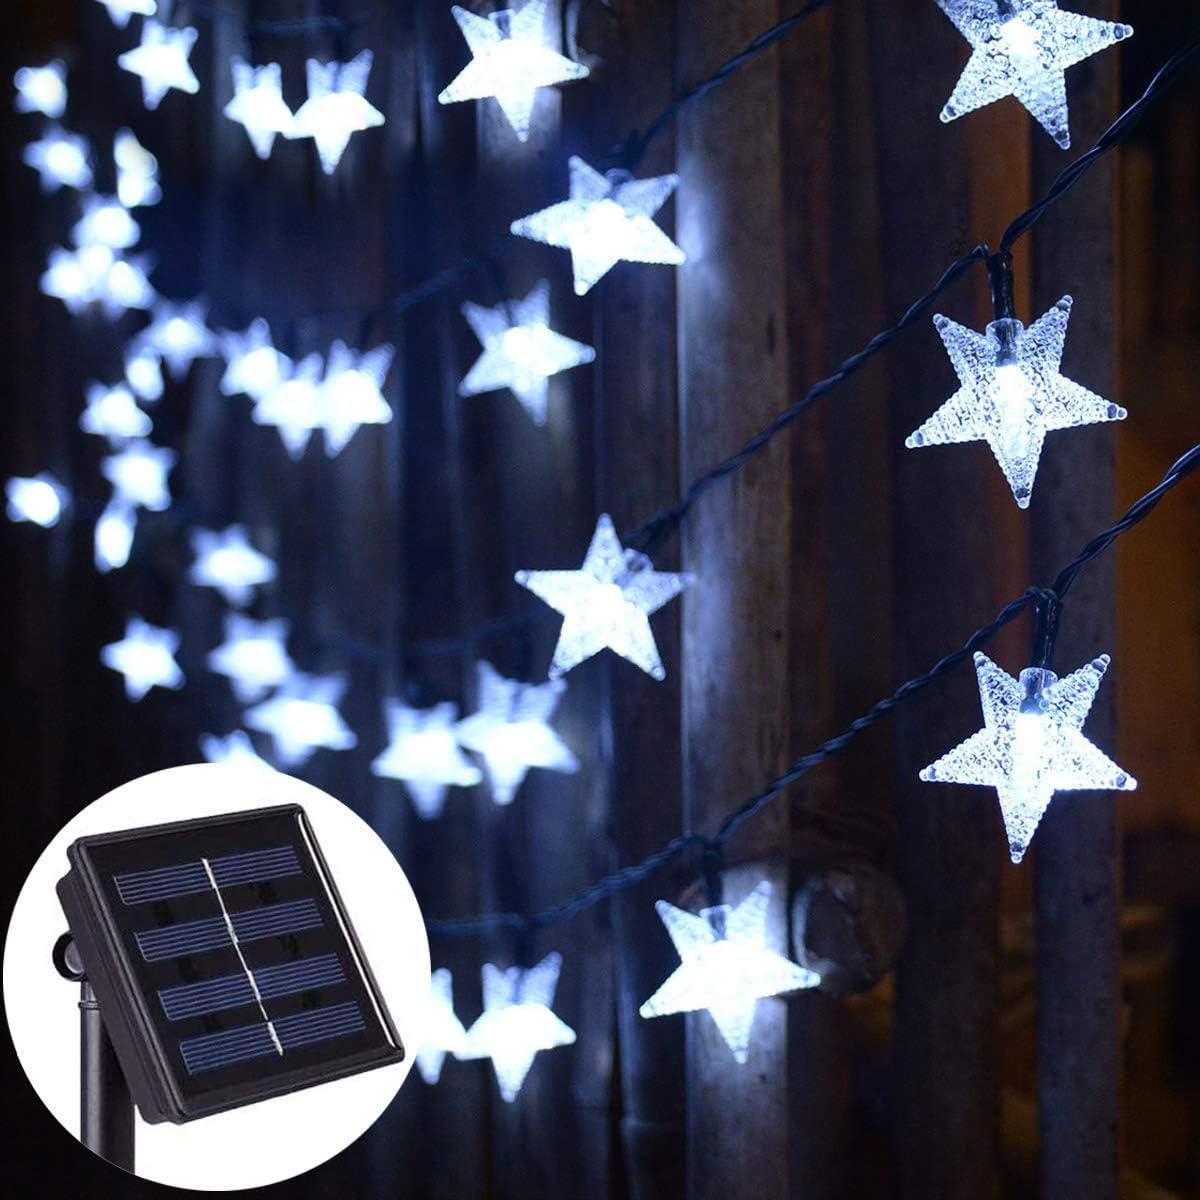 Abkshine Solar Powered Fairy Lights,Cool White Waterproof Solar Patio Umbrella Summer Lights, 30ft 50 LED Solar String Lights for Christmas Garden Yard Decoration